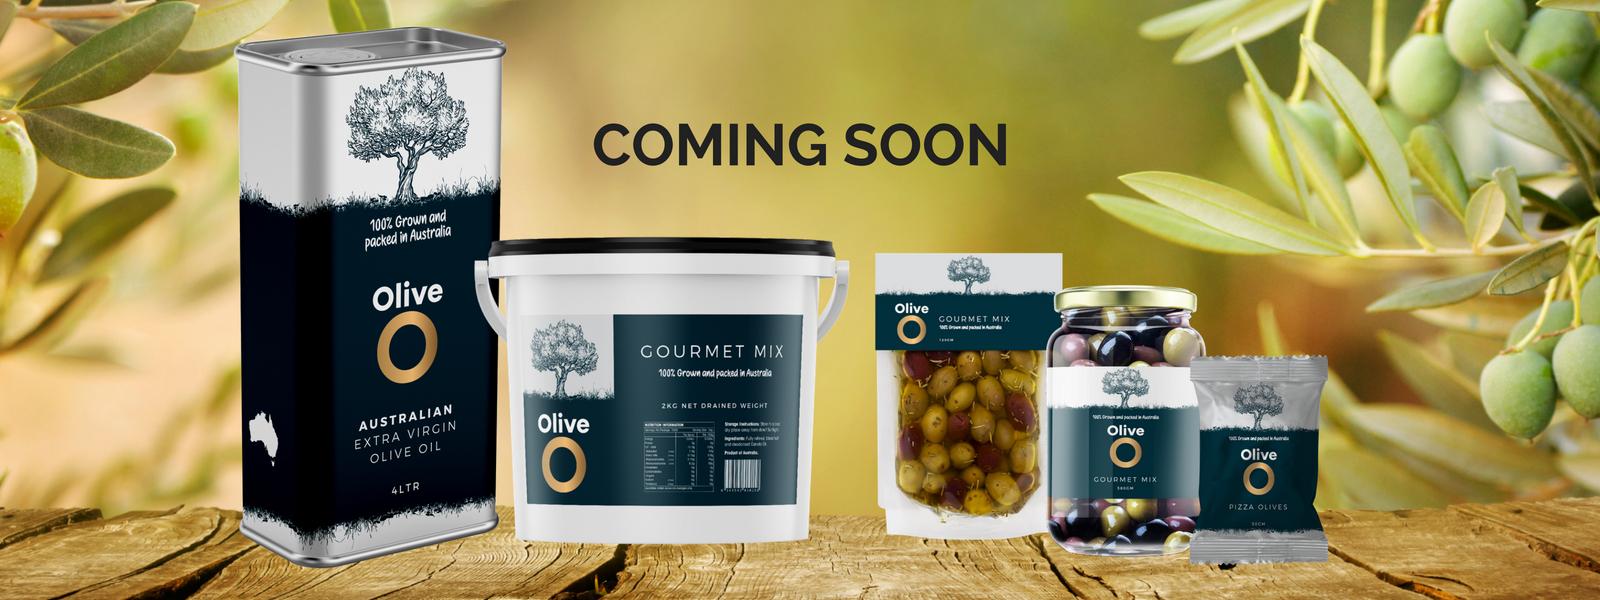 Olive O imagery.jpg